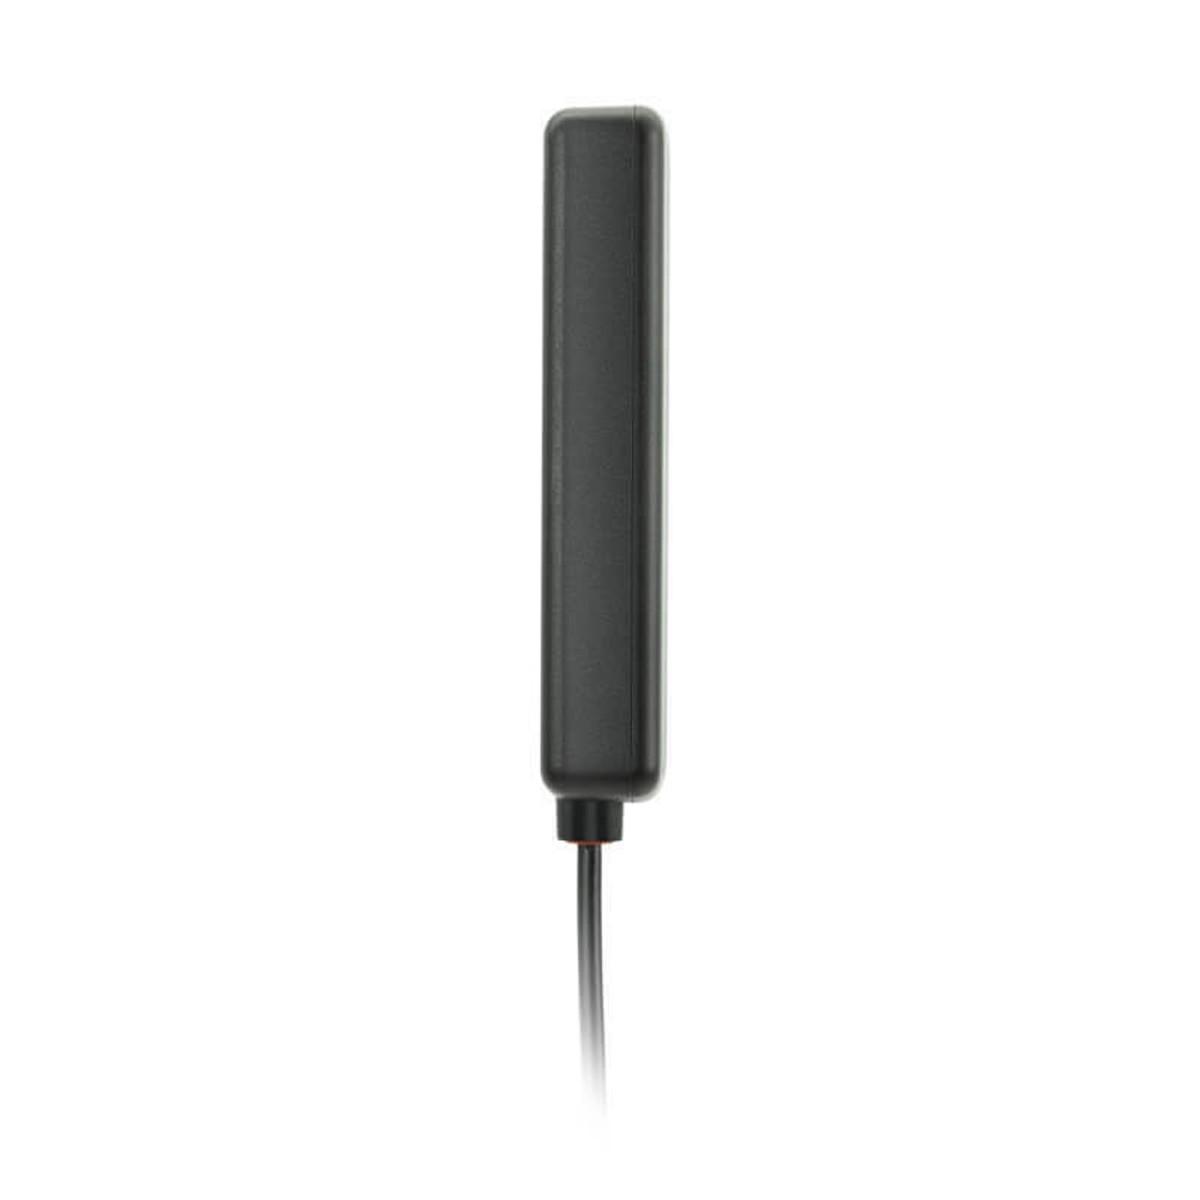 Wilson 4G Slim Low-Profile Antenna, 50 Ohm   314401